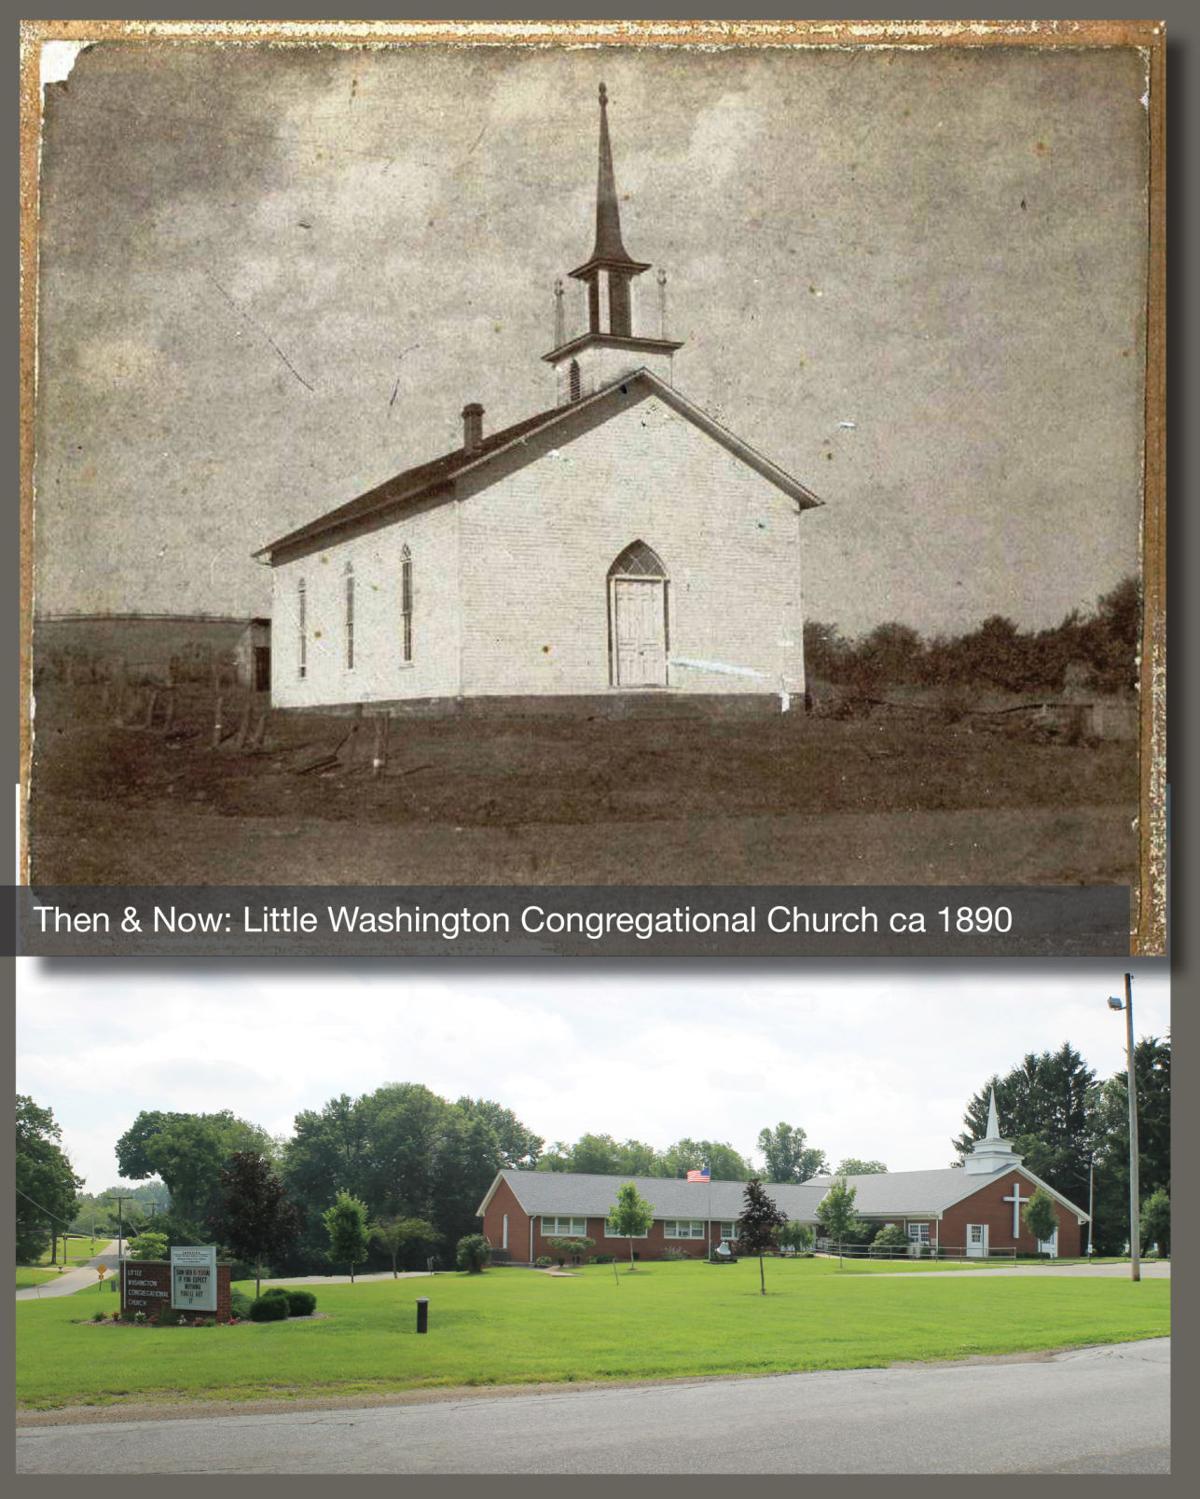 Then & Now: Little Washington